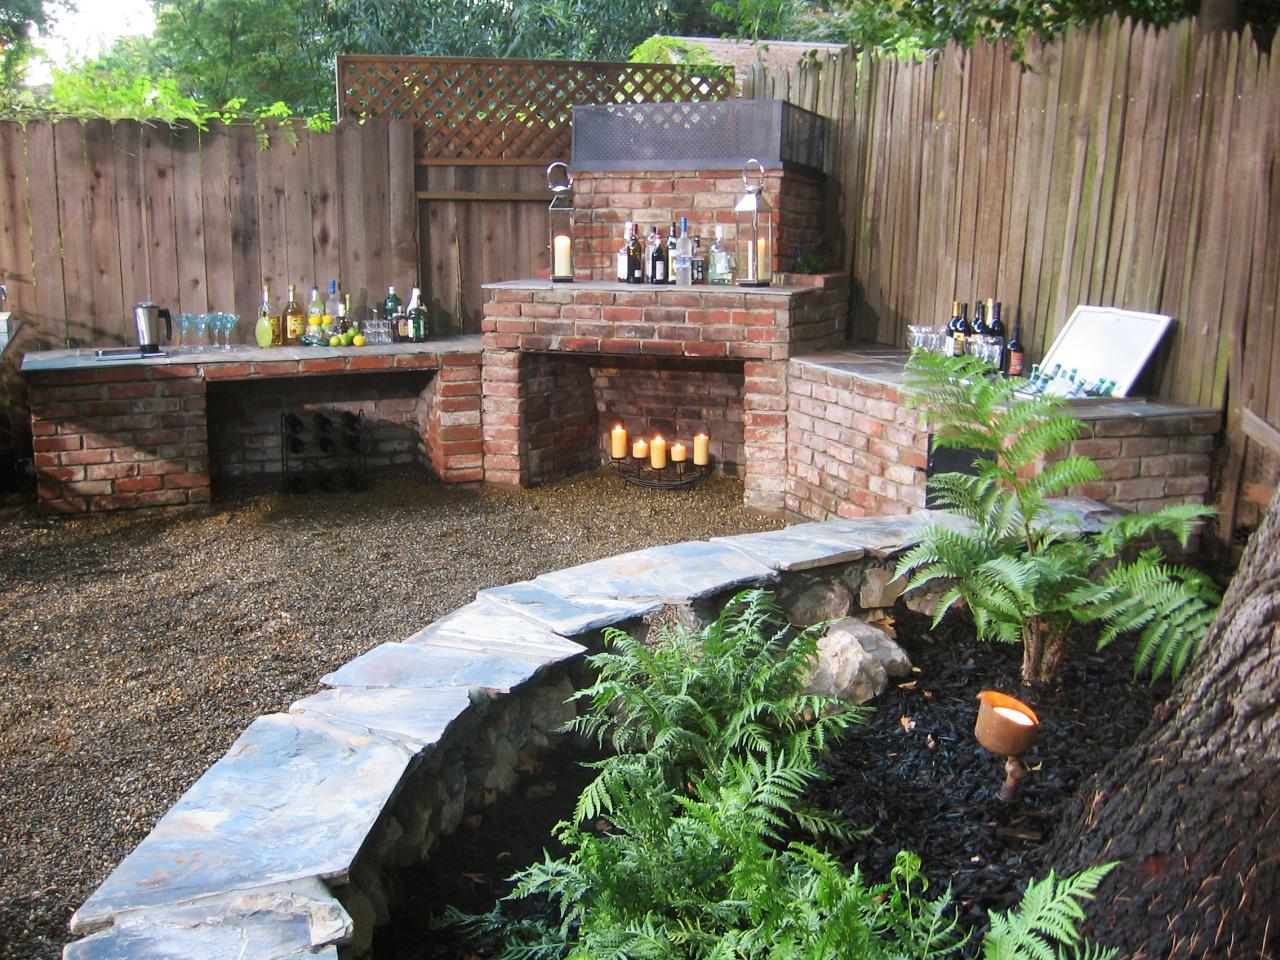 backyard fireplace featured in yard crashers episode  VMFAREN